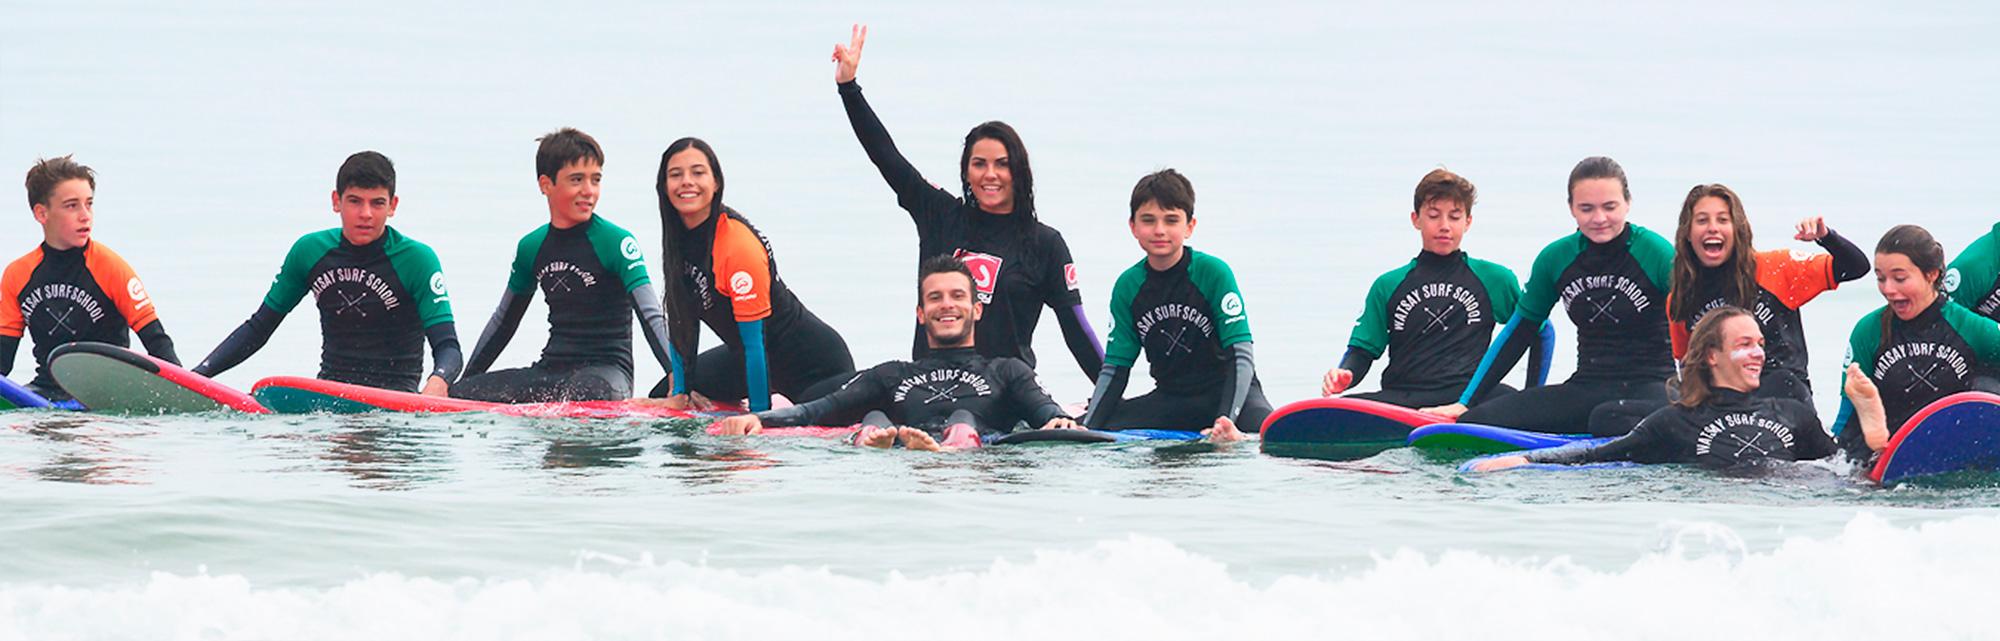 Cursos de surf - Clases de surf - en cantabria